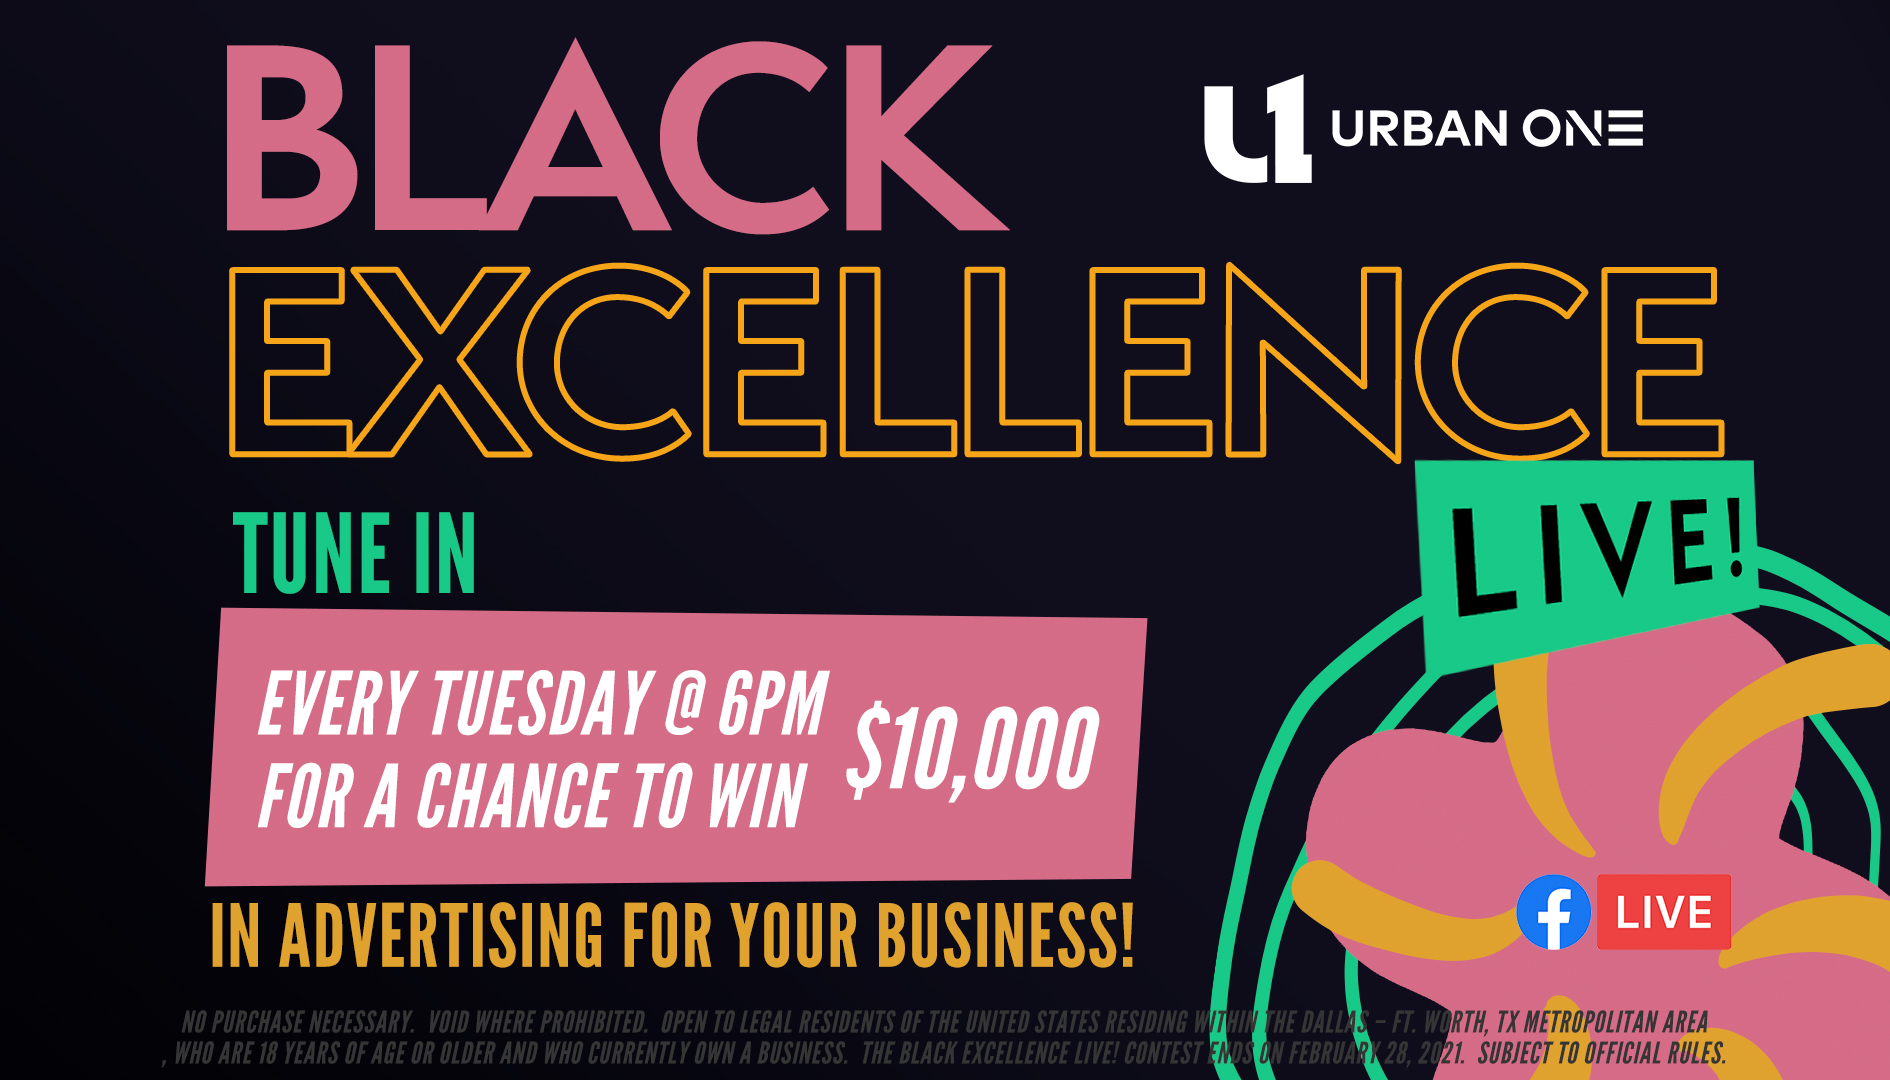 Black Excellence Live